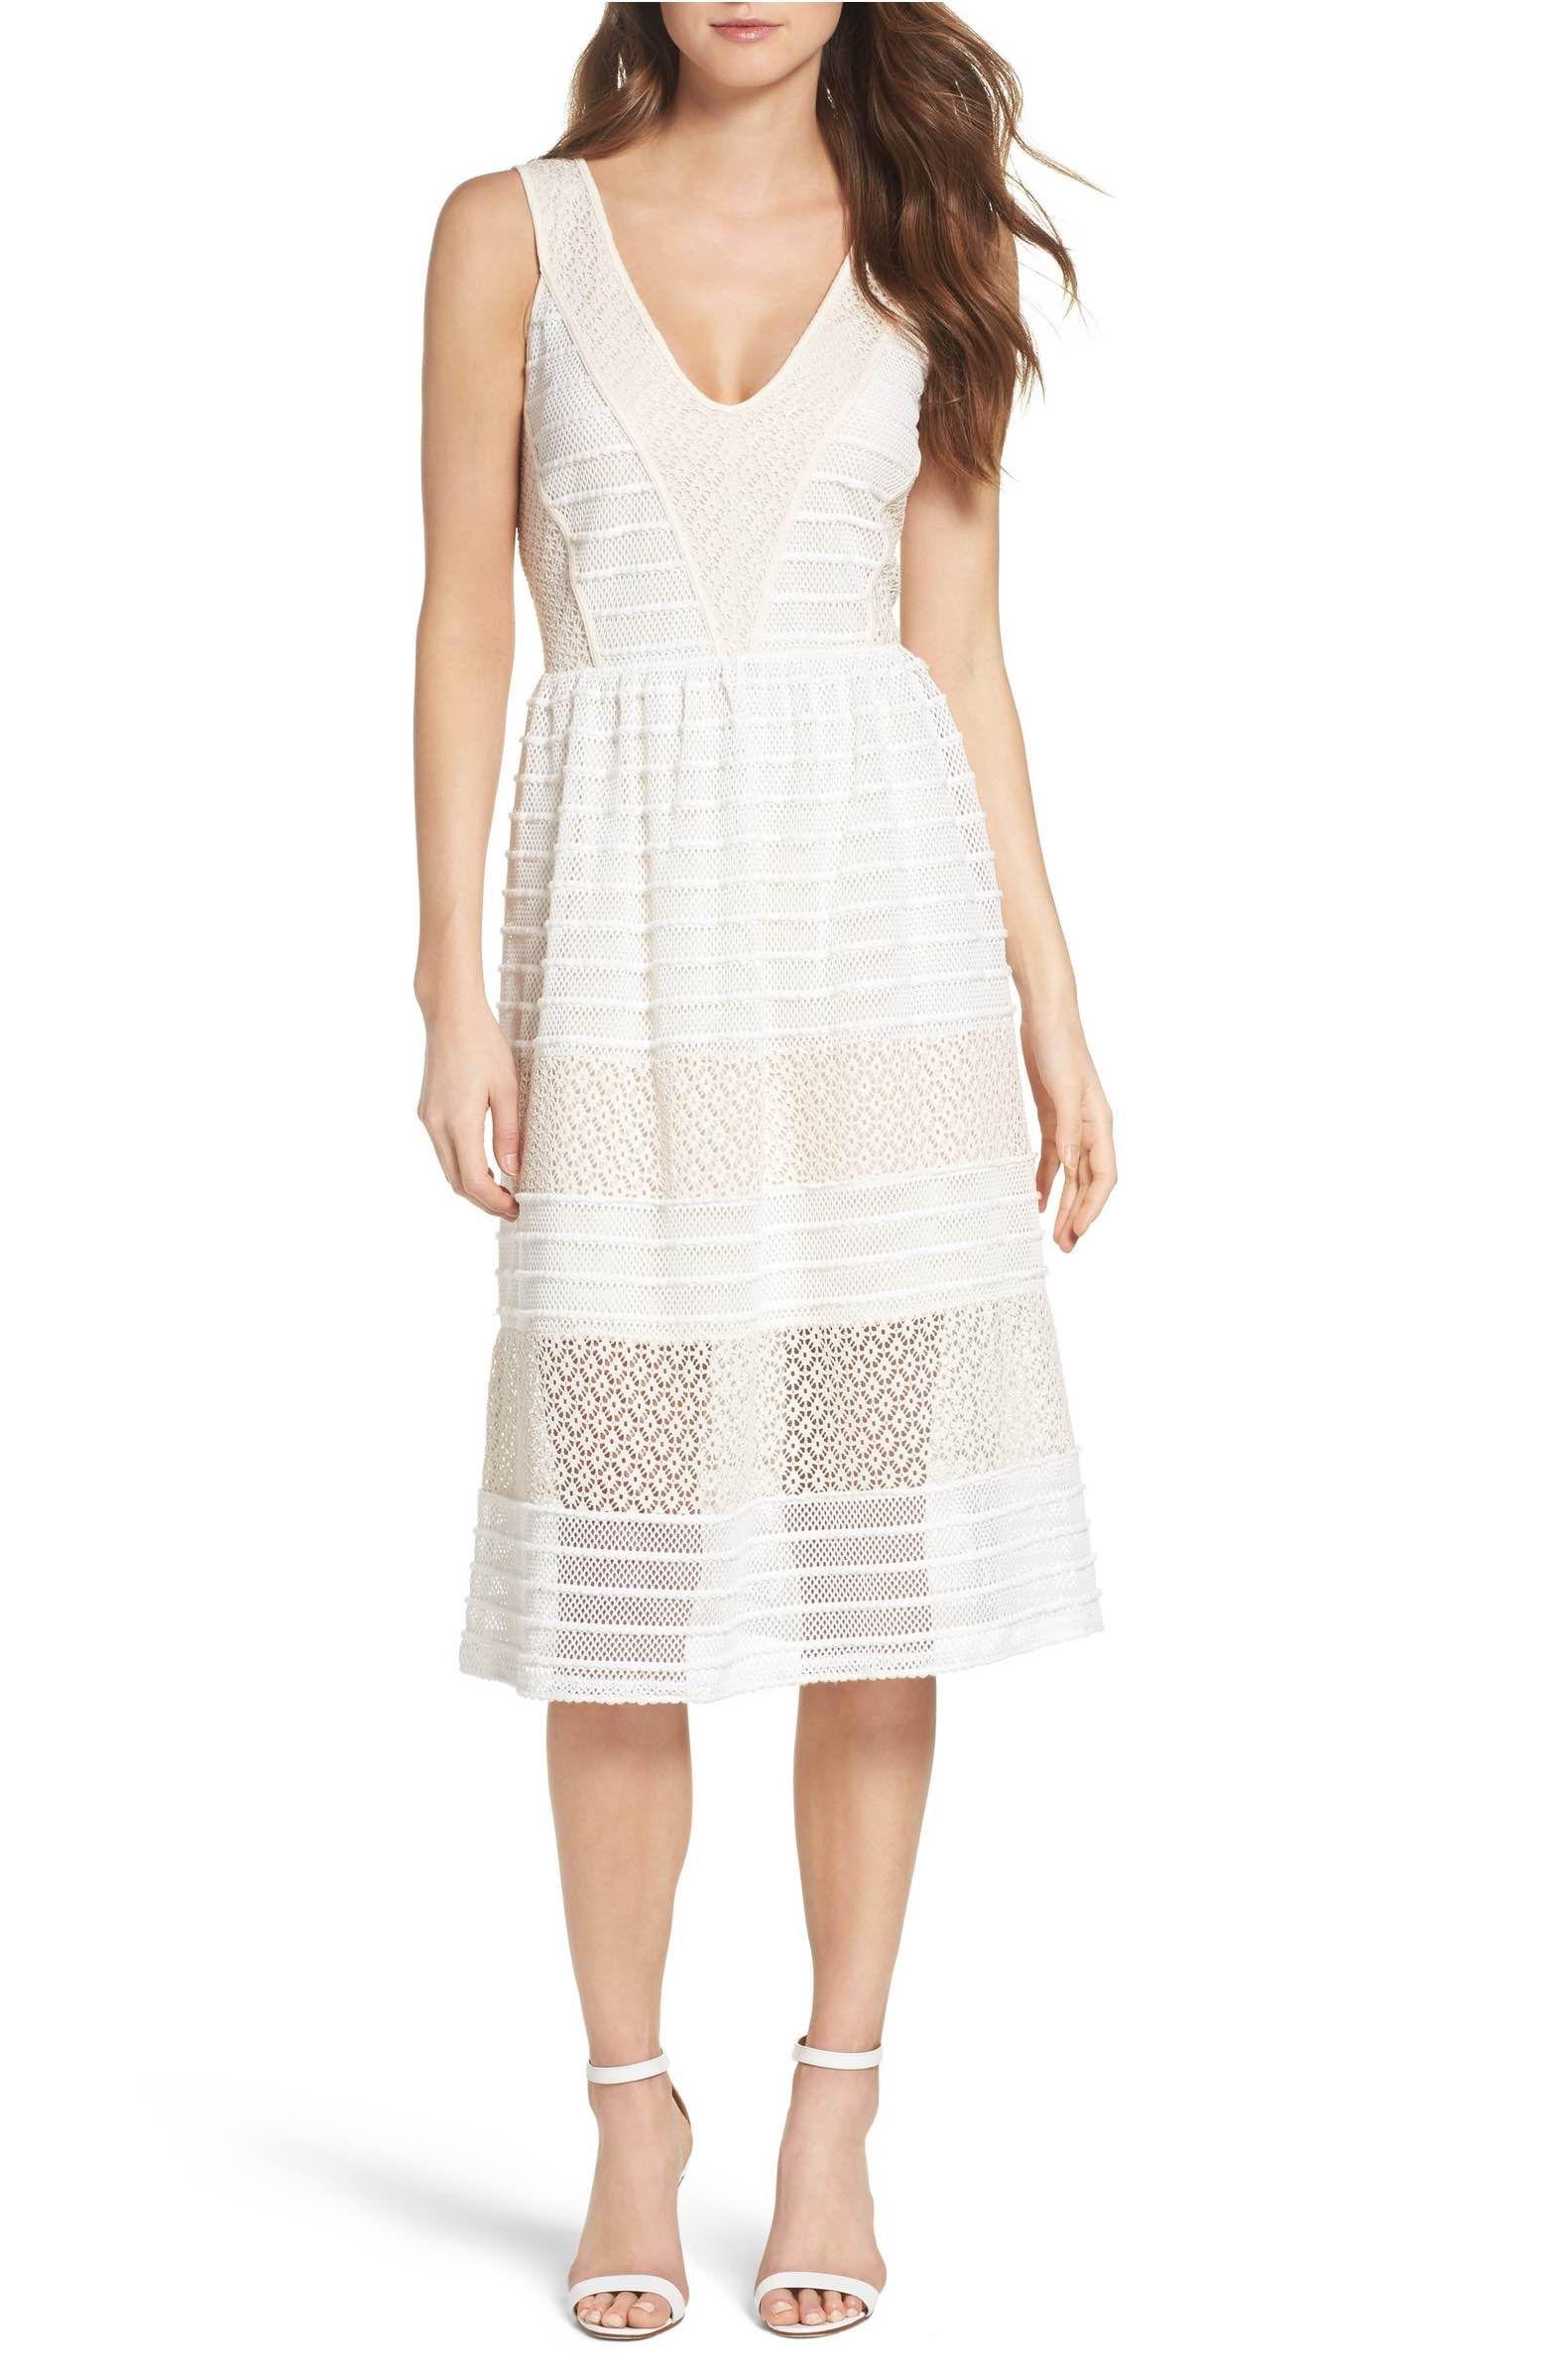 3ed4d27323a Main Image - Chelsea28 Lace Midi Dress